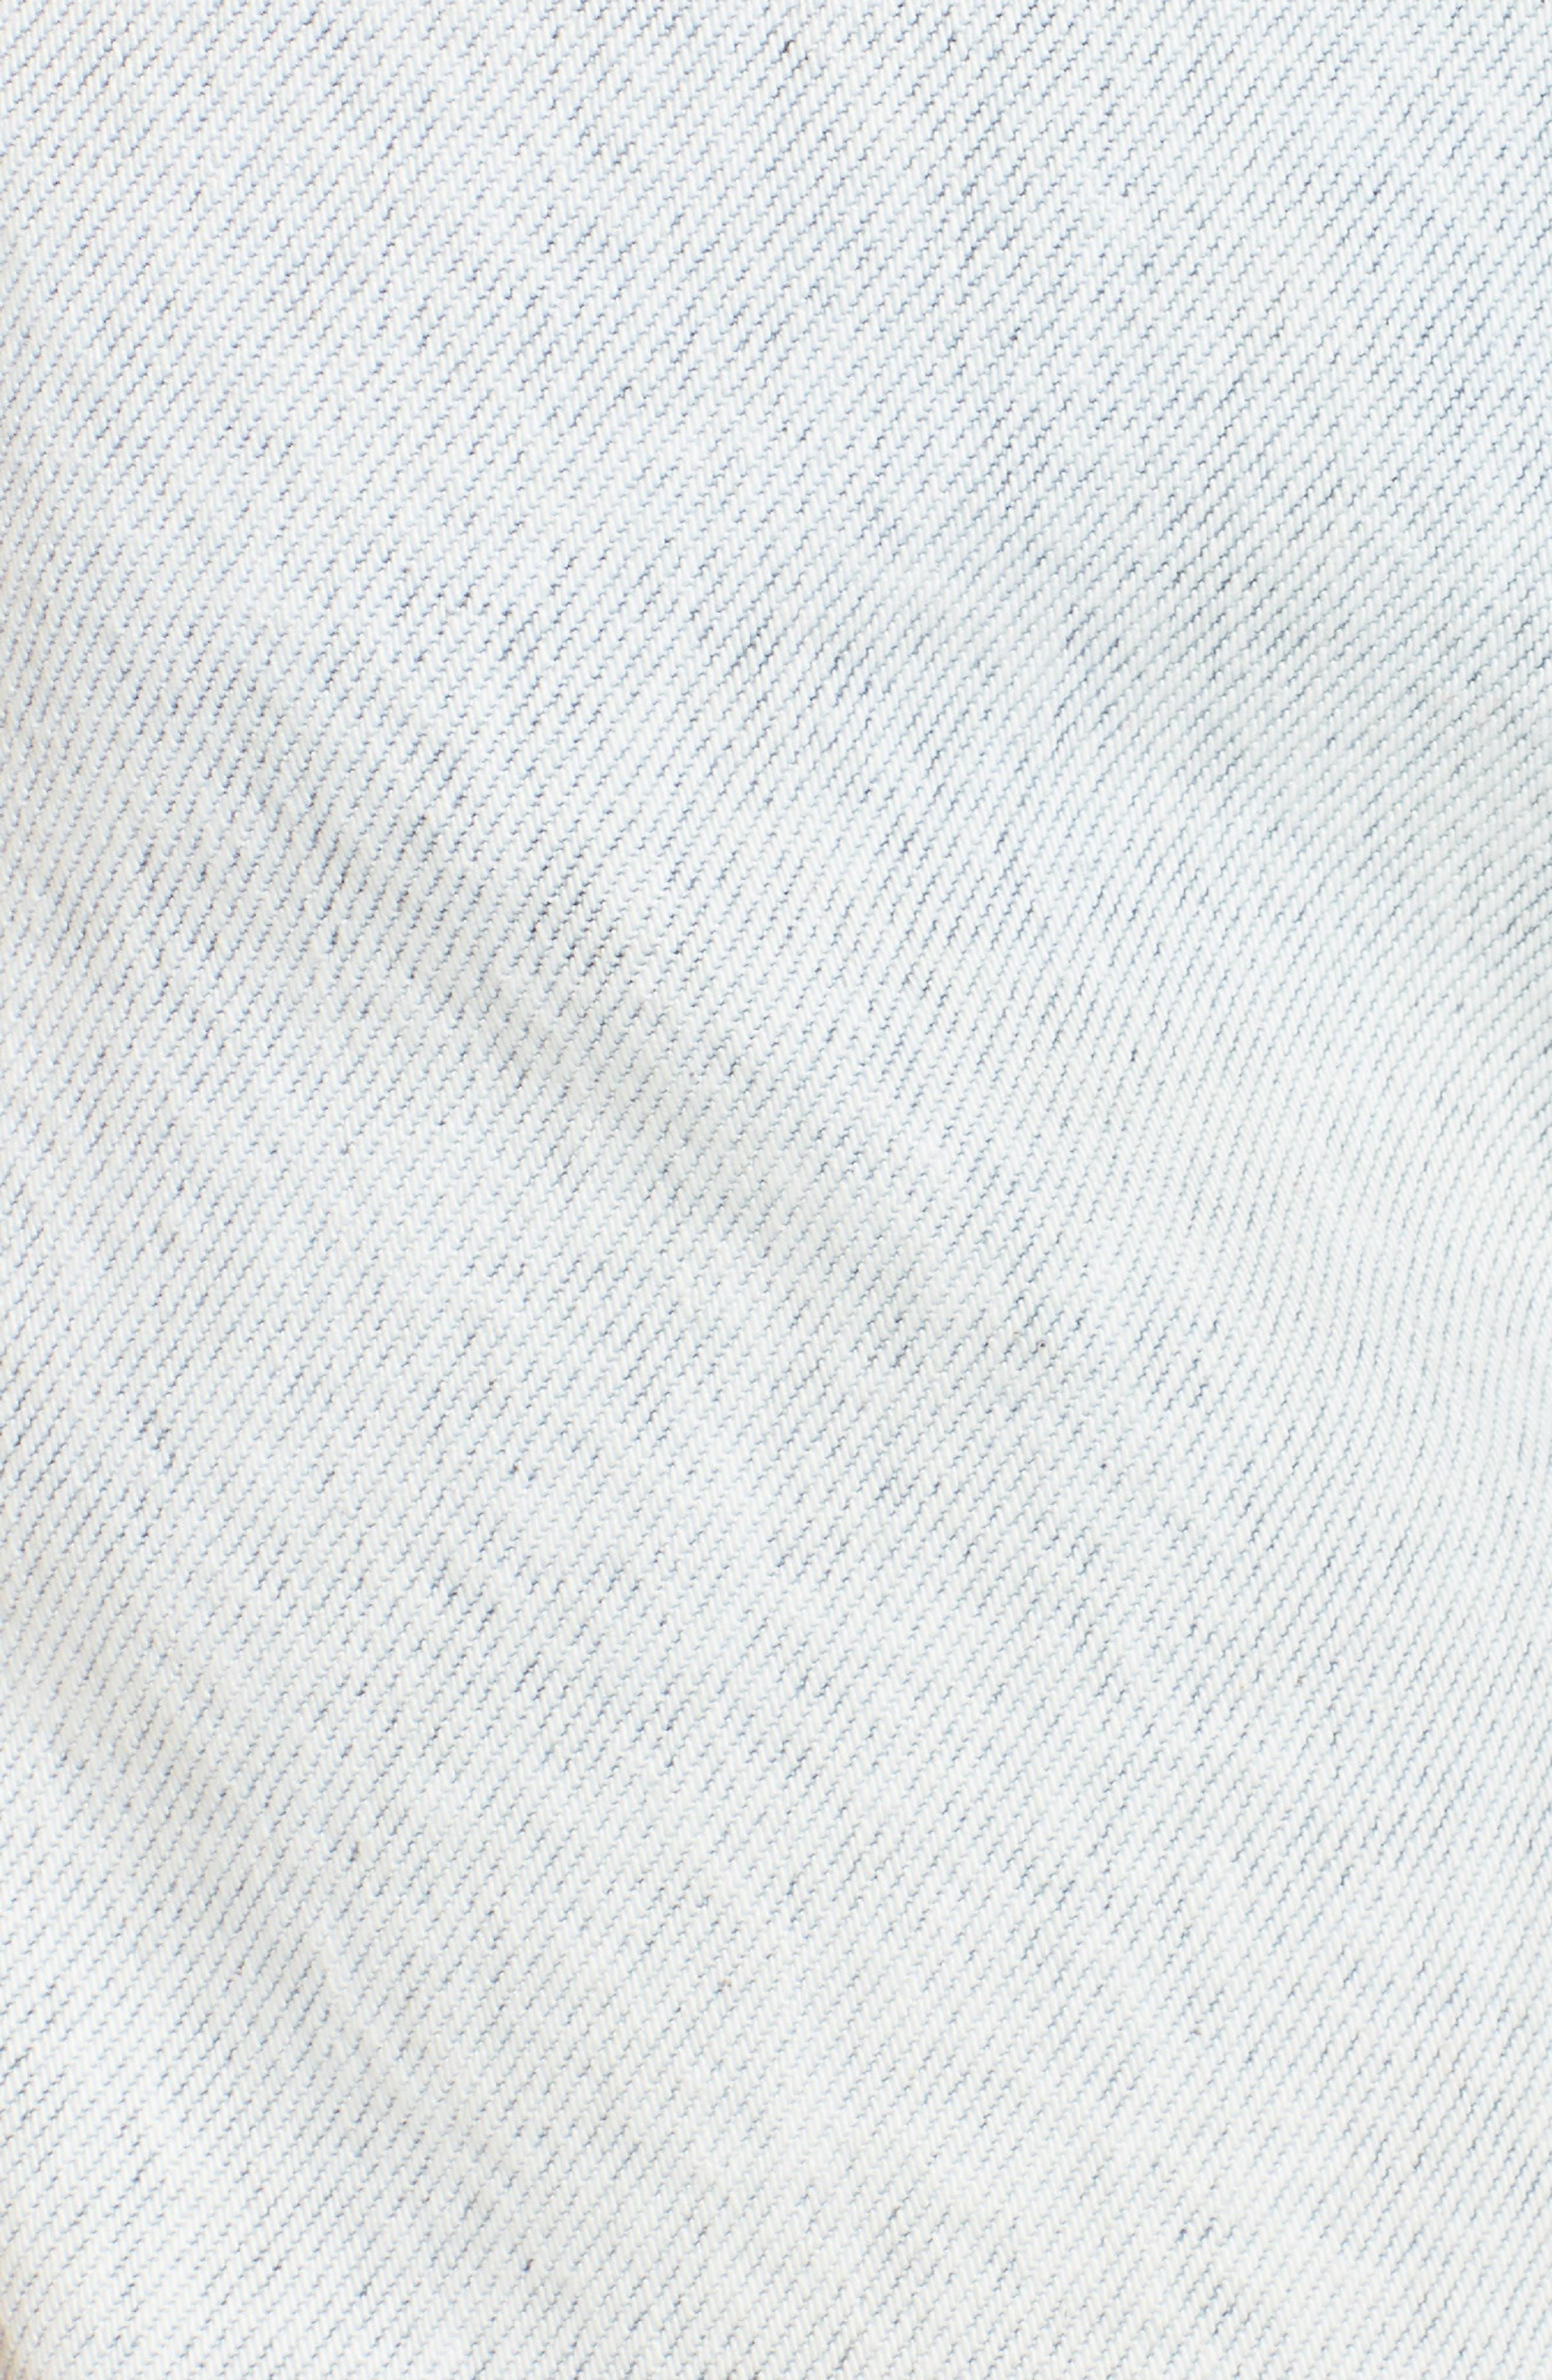 x Margherita Amore Denim Cutoff Shorts,                             Alternate thumbnail 5, color,                             Capriember